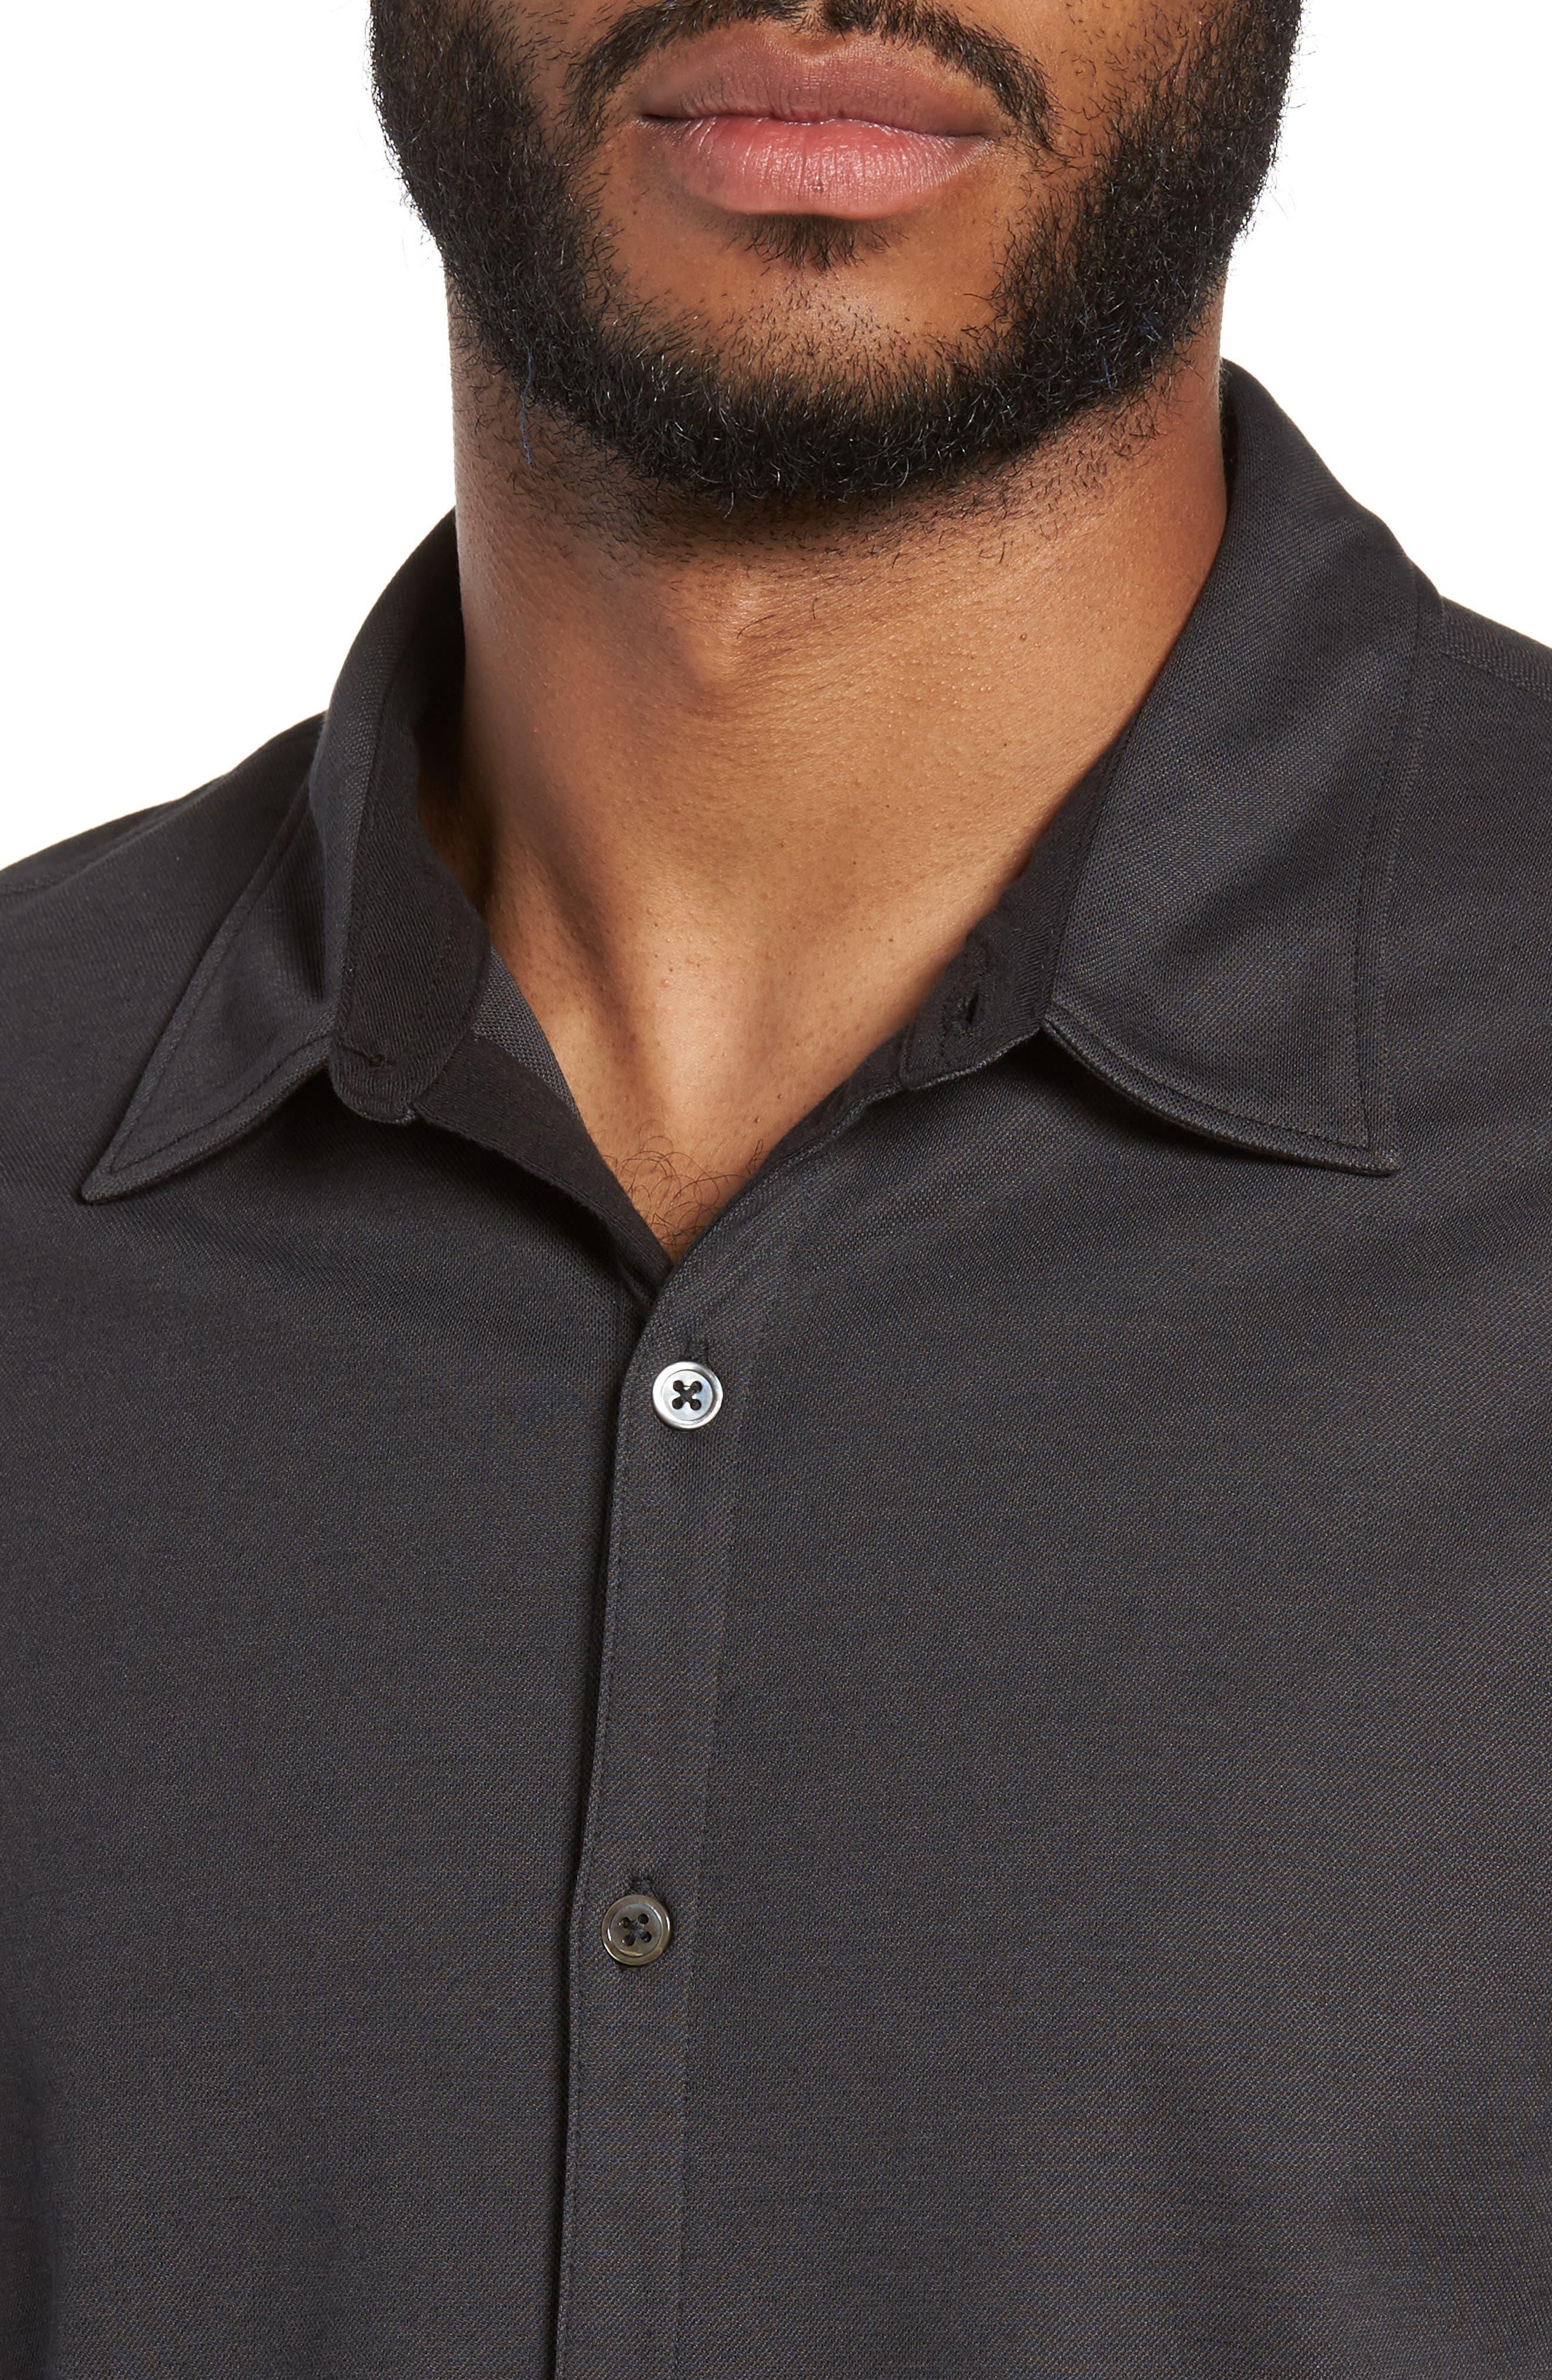 Glacier Knit Sport Shirt,                             Alternate thumbnail 4, color,                             001